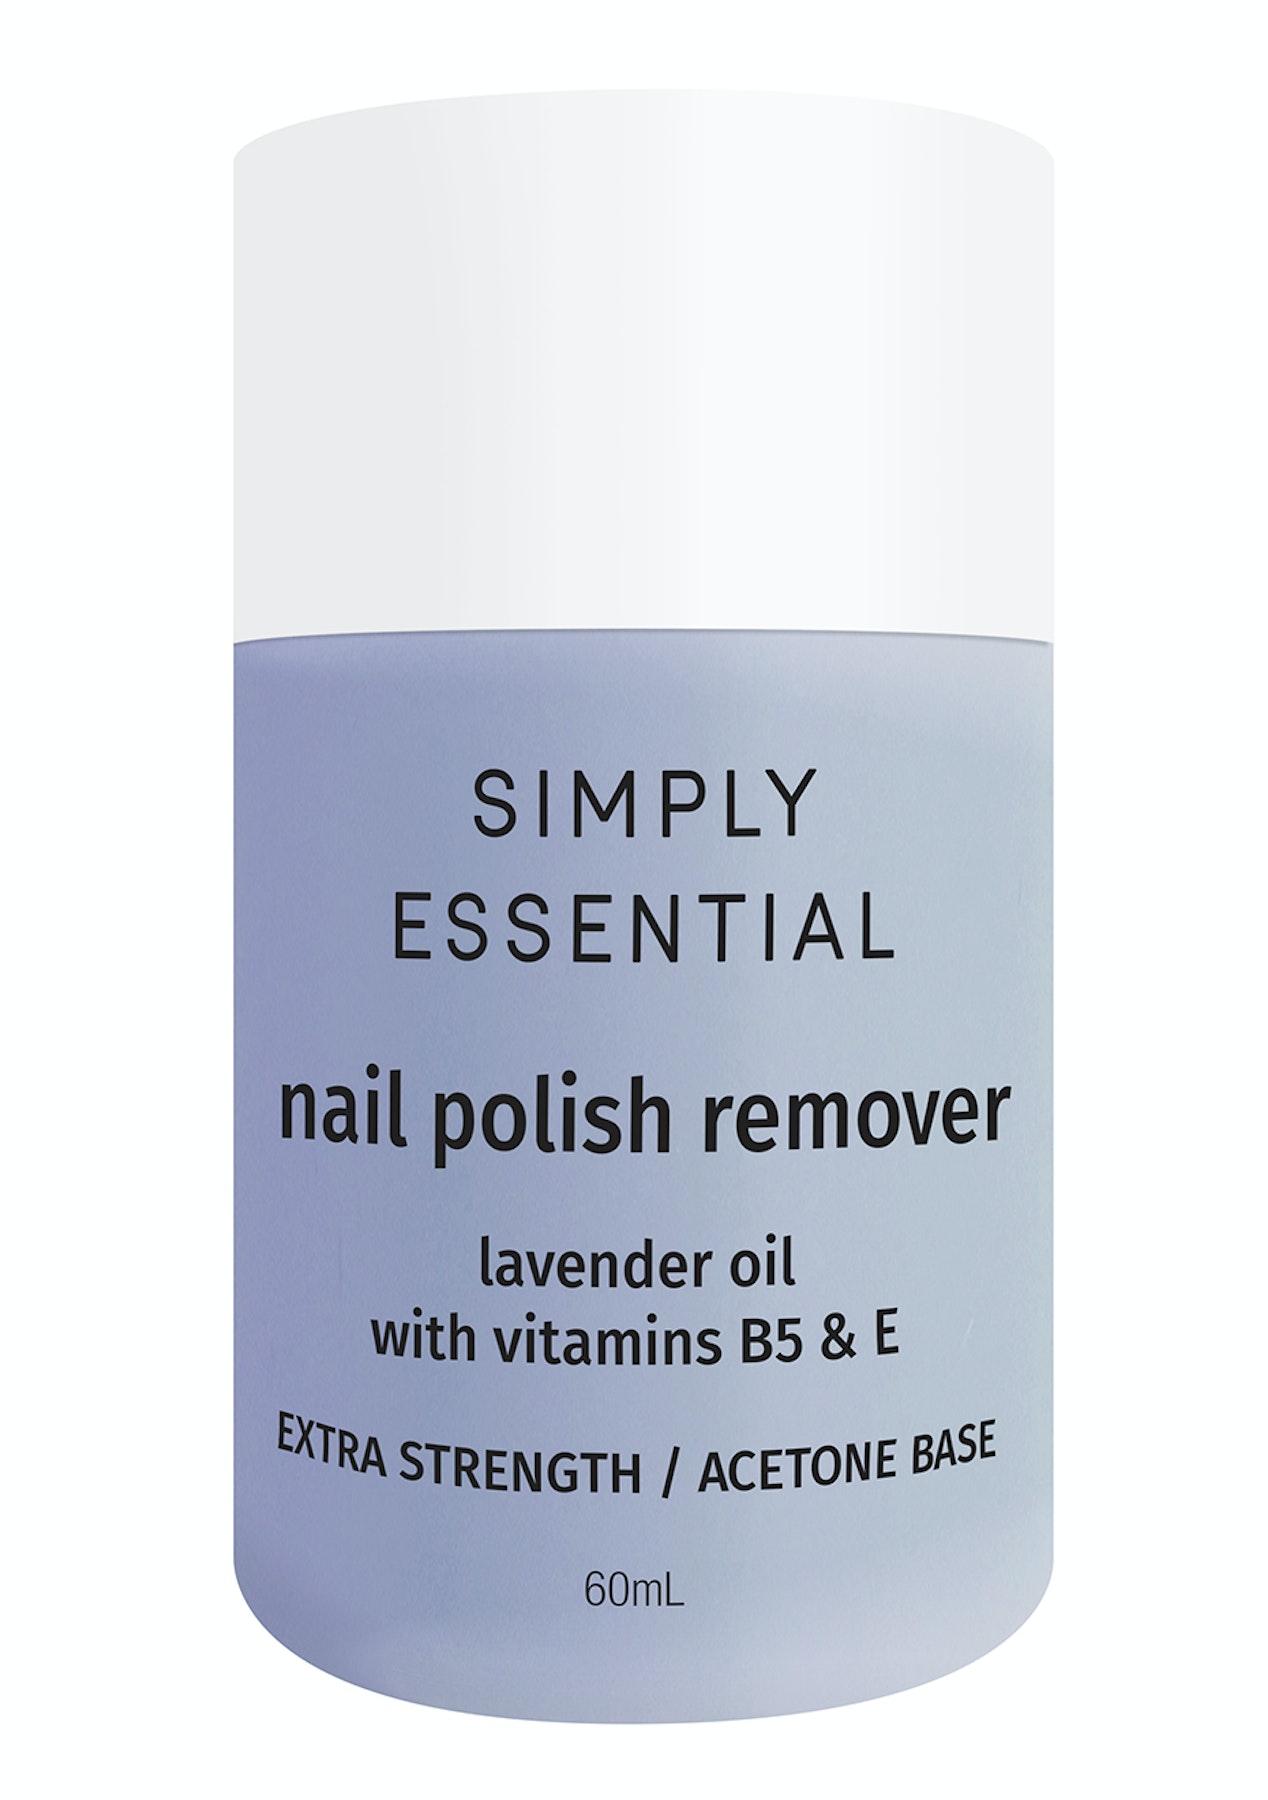 Simply Essentials - Nail Polish Remover - Blue Extra Strength (Acetone) 60ml